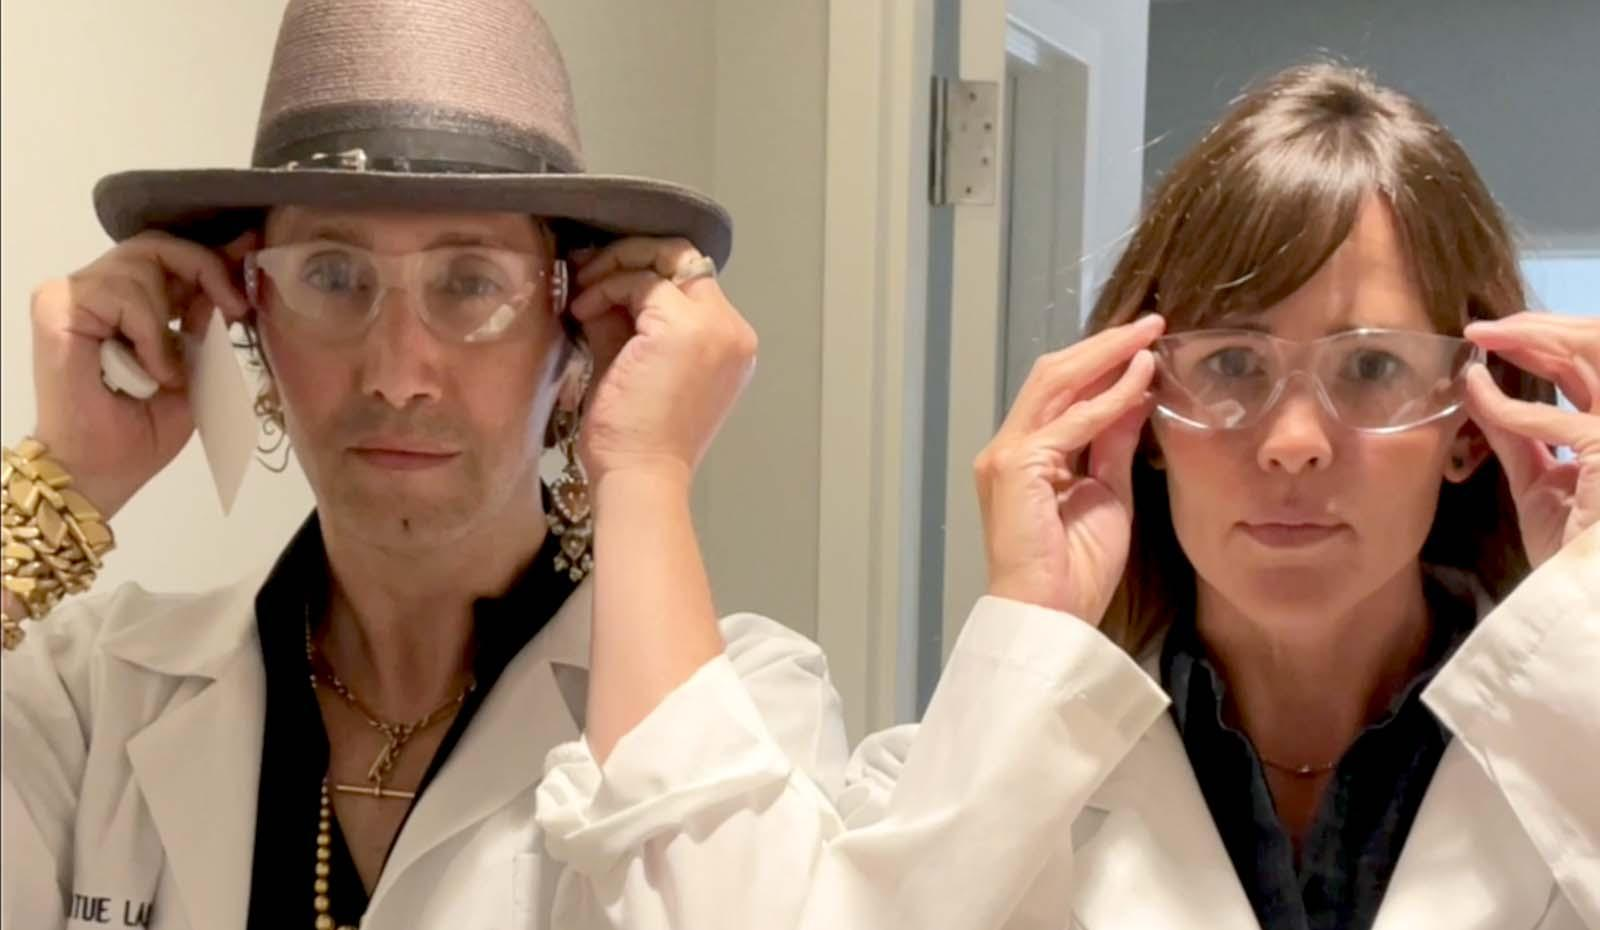 Jennifer Garner & Adir Abergel Go Behind the Scenes on Virtue's Science